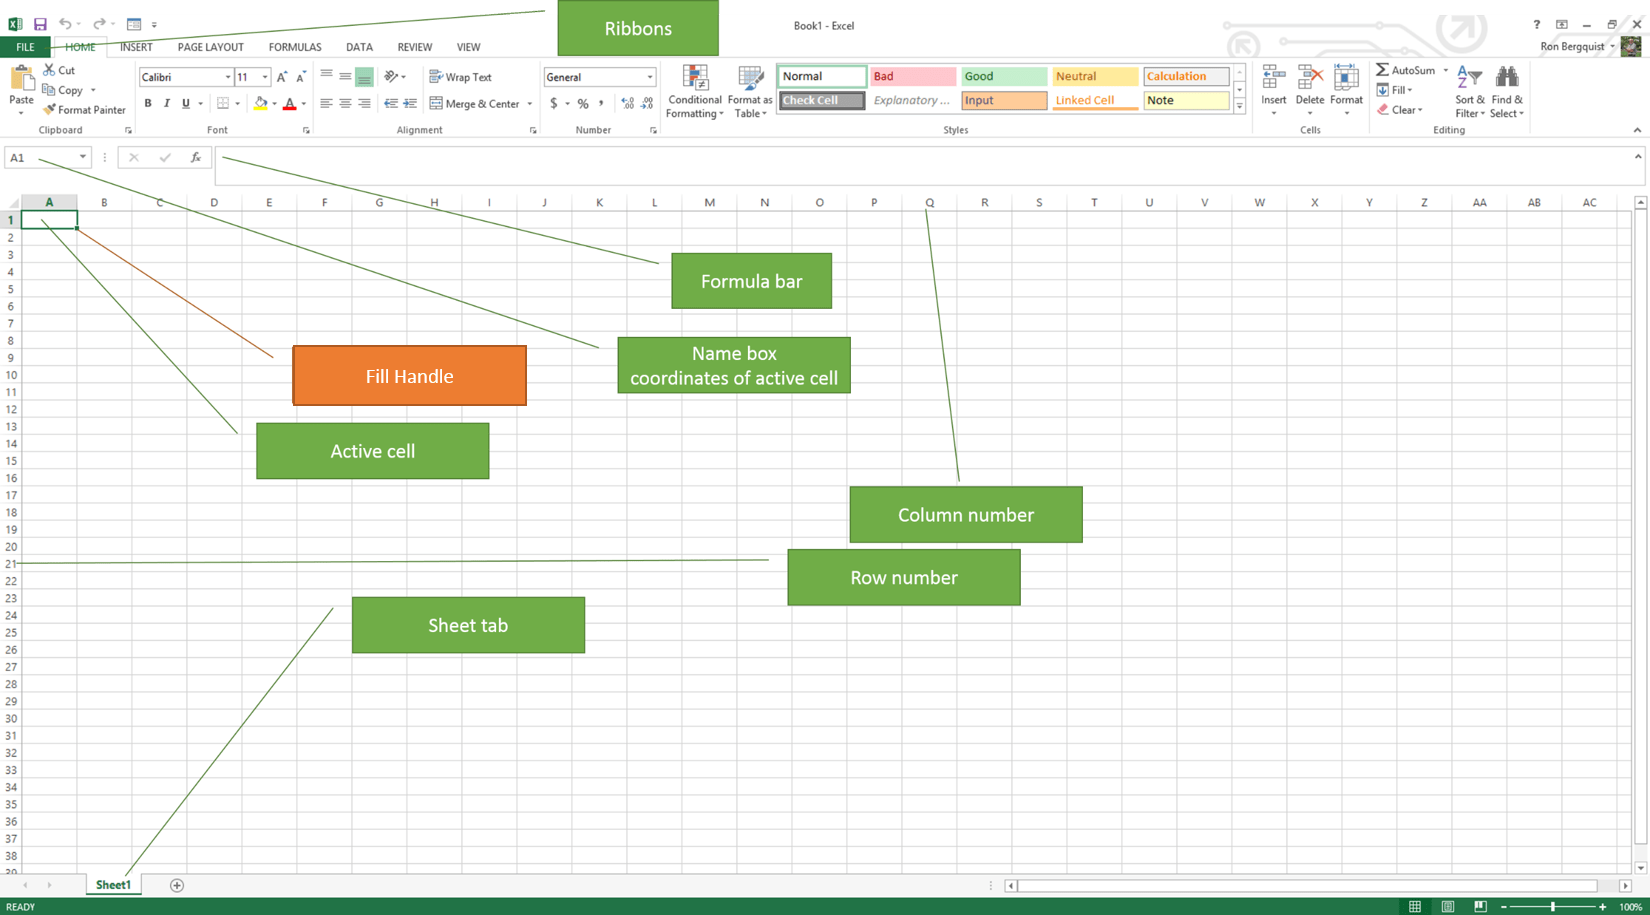 Inls161 002 Fall Information Tools